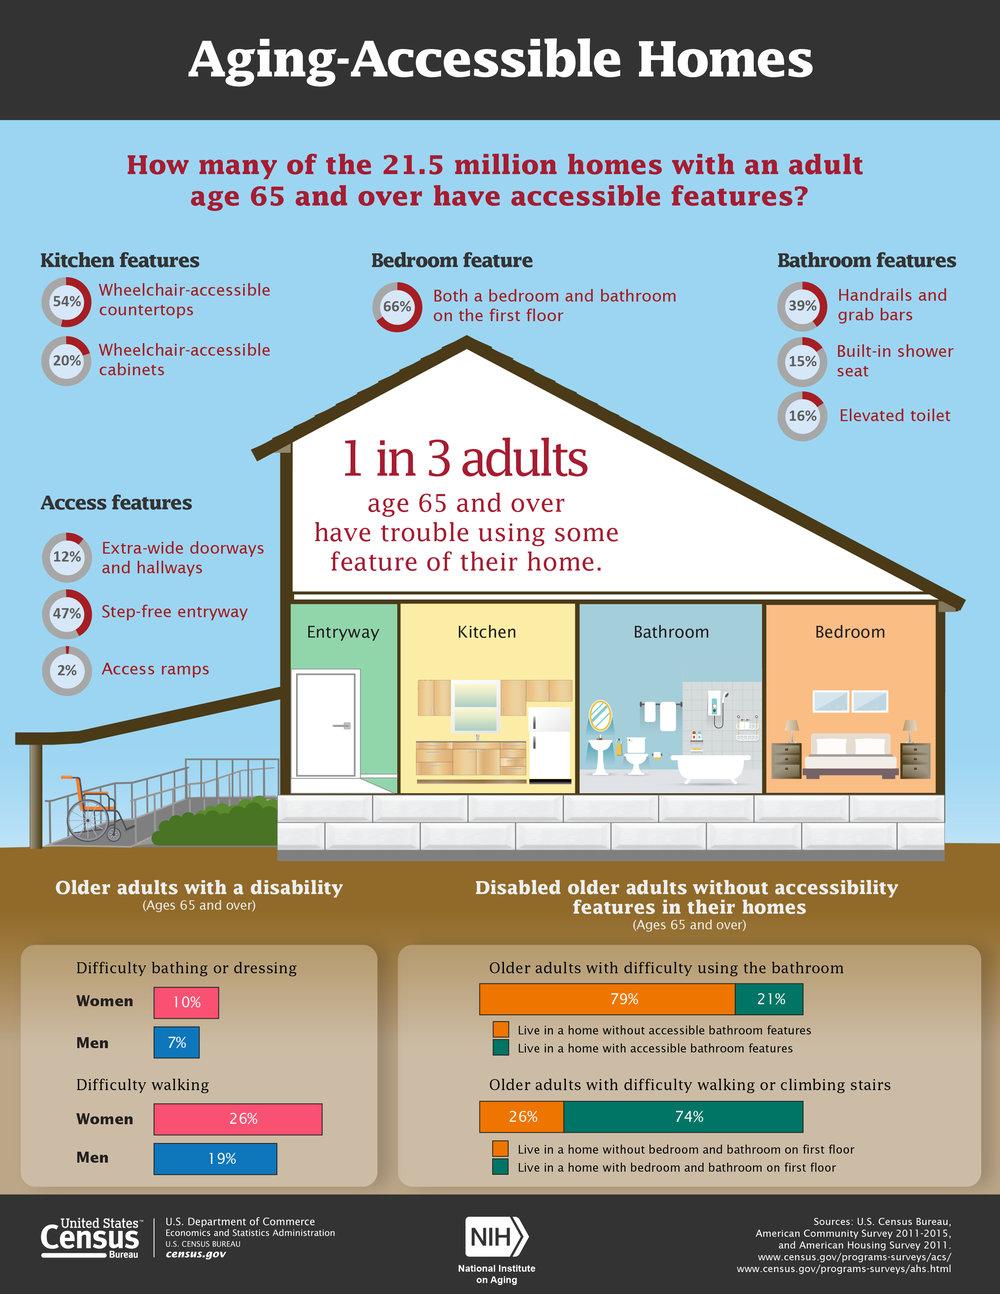 Source:   U.S. Census Bureau, American Community Survey 2011-2015, and American Housing Survey 2011.  www.census.gov/programs-surveys/acs/   www.census.gov/programs-surveys/ahs.html